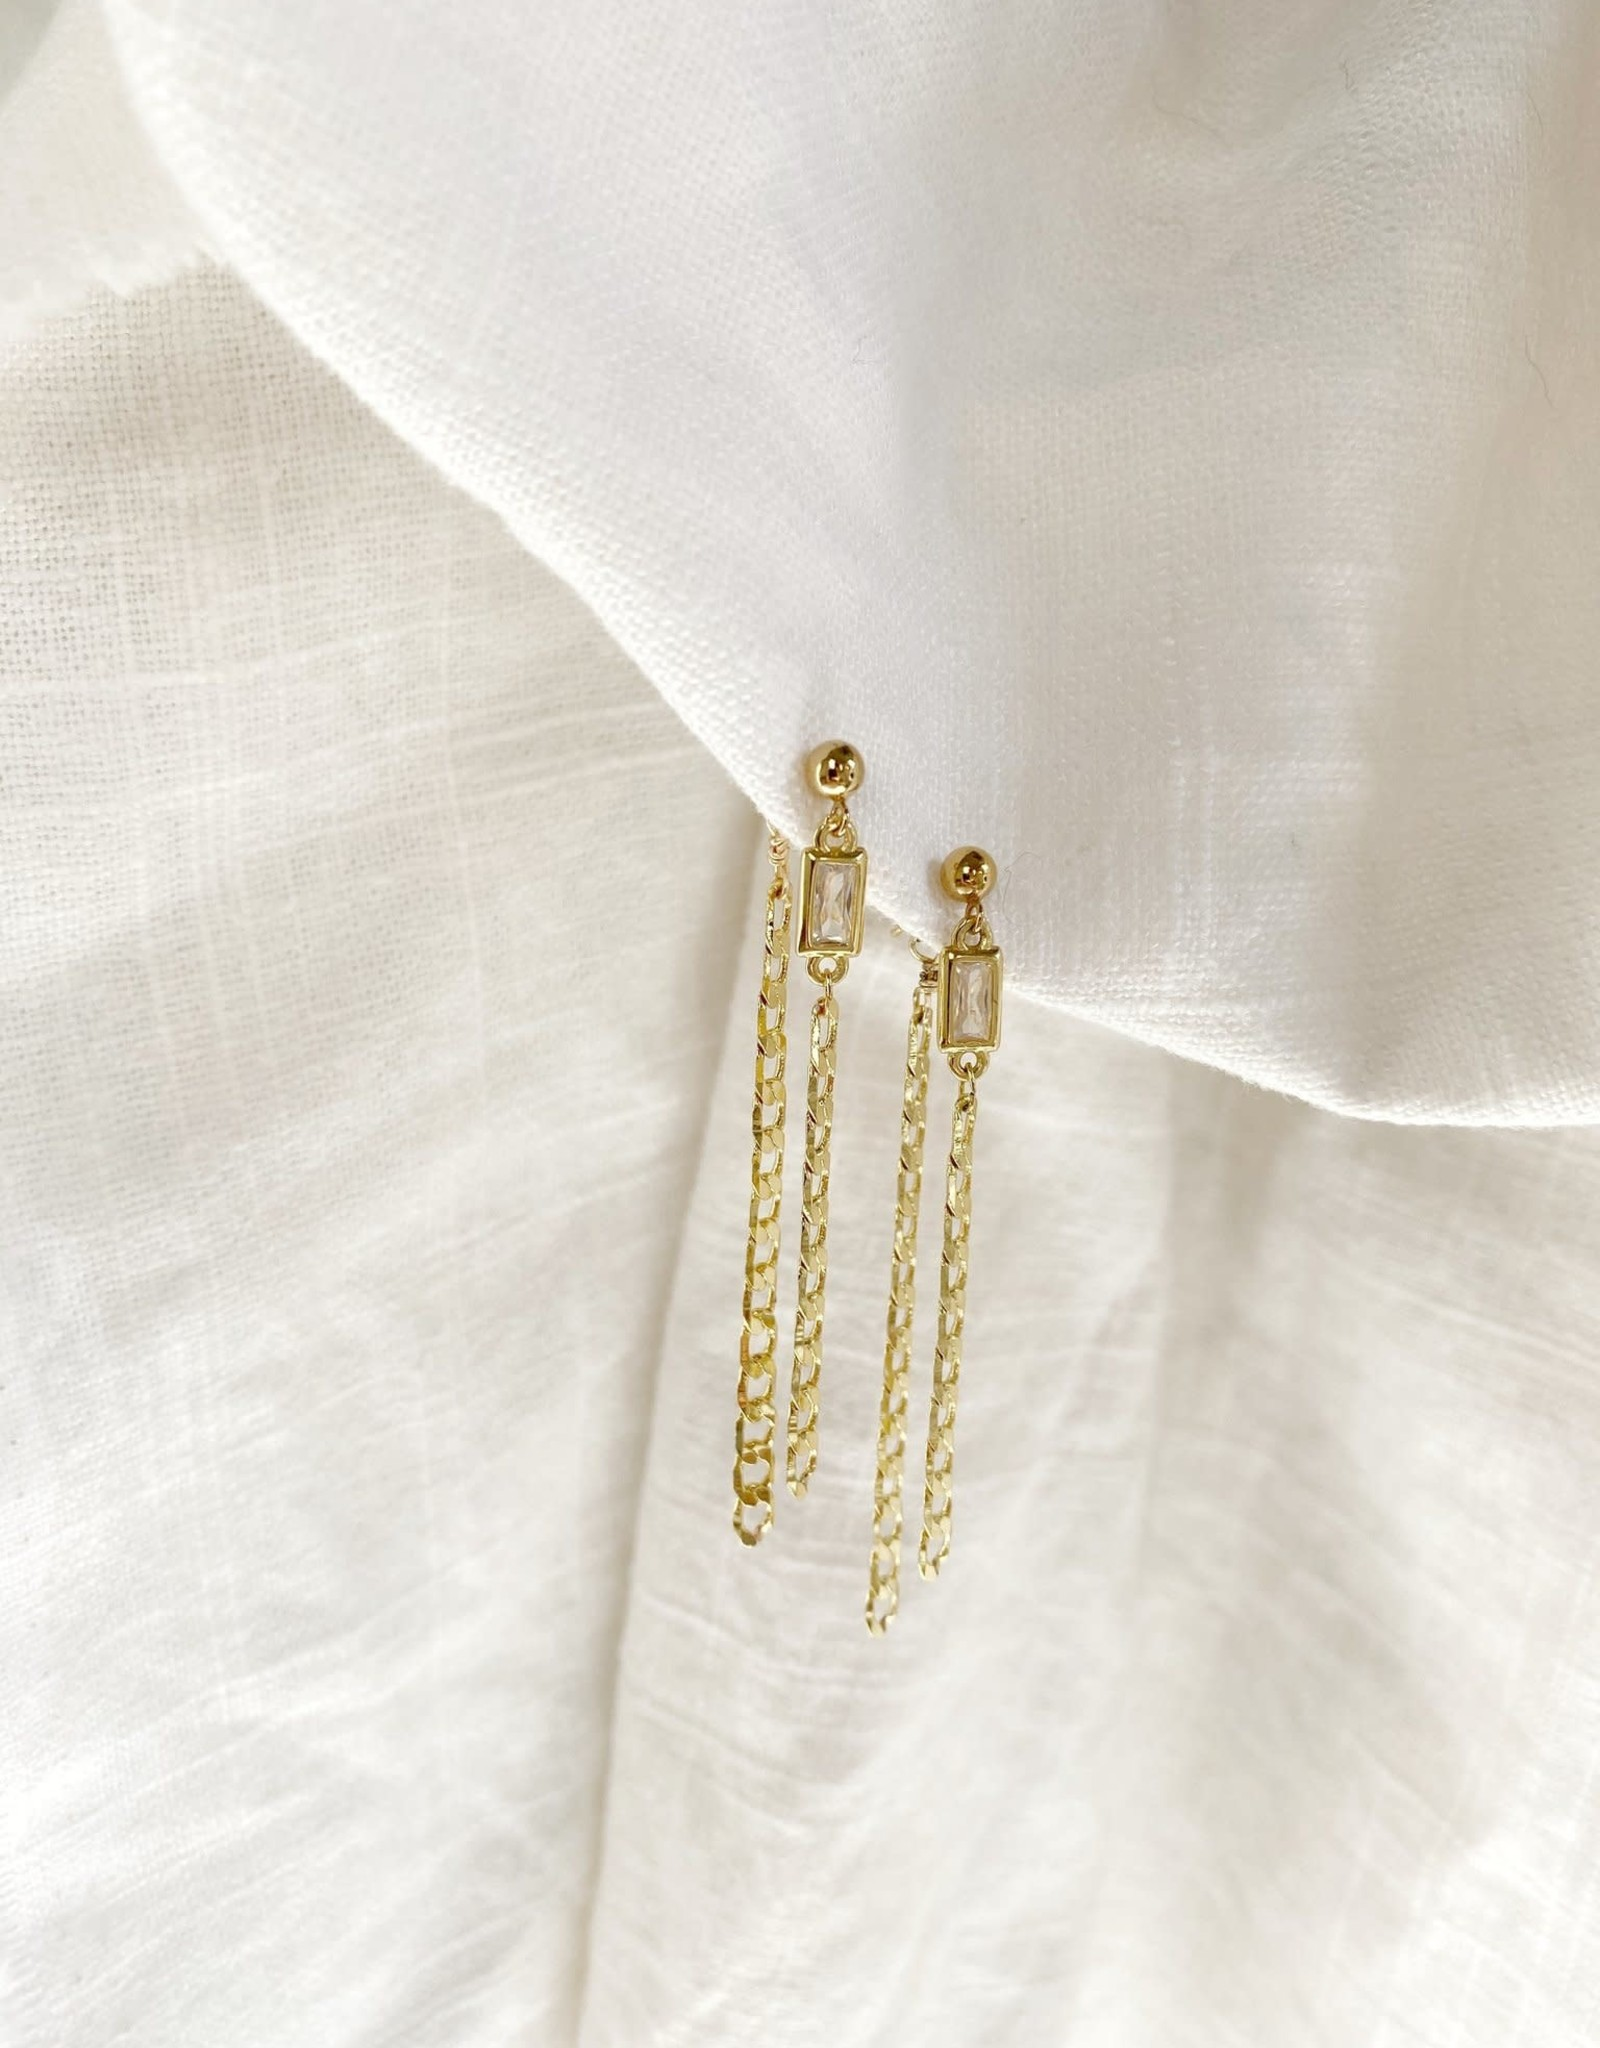 Bofemme Bofemme Spritz Earrings